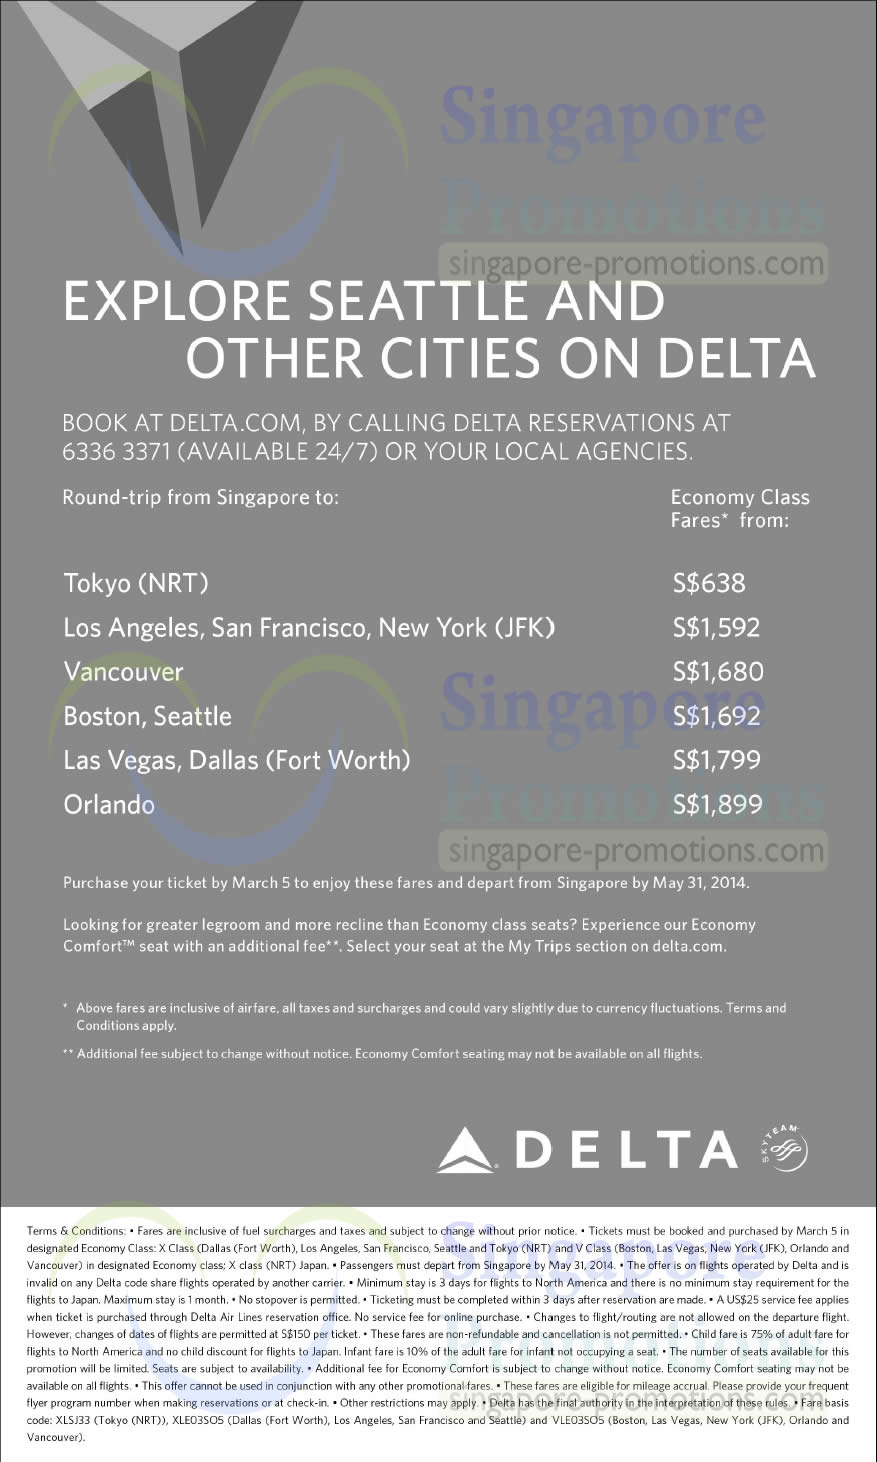 Delta Airlines 25 Feb 2014